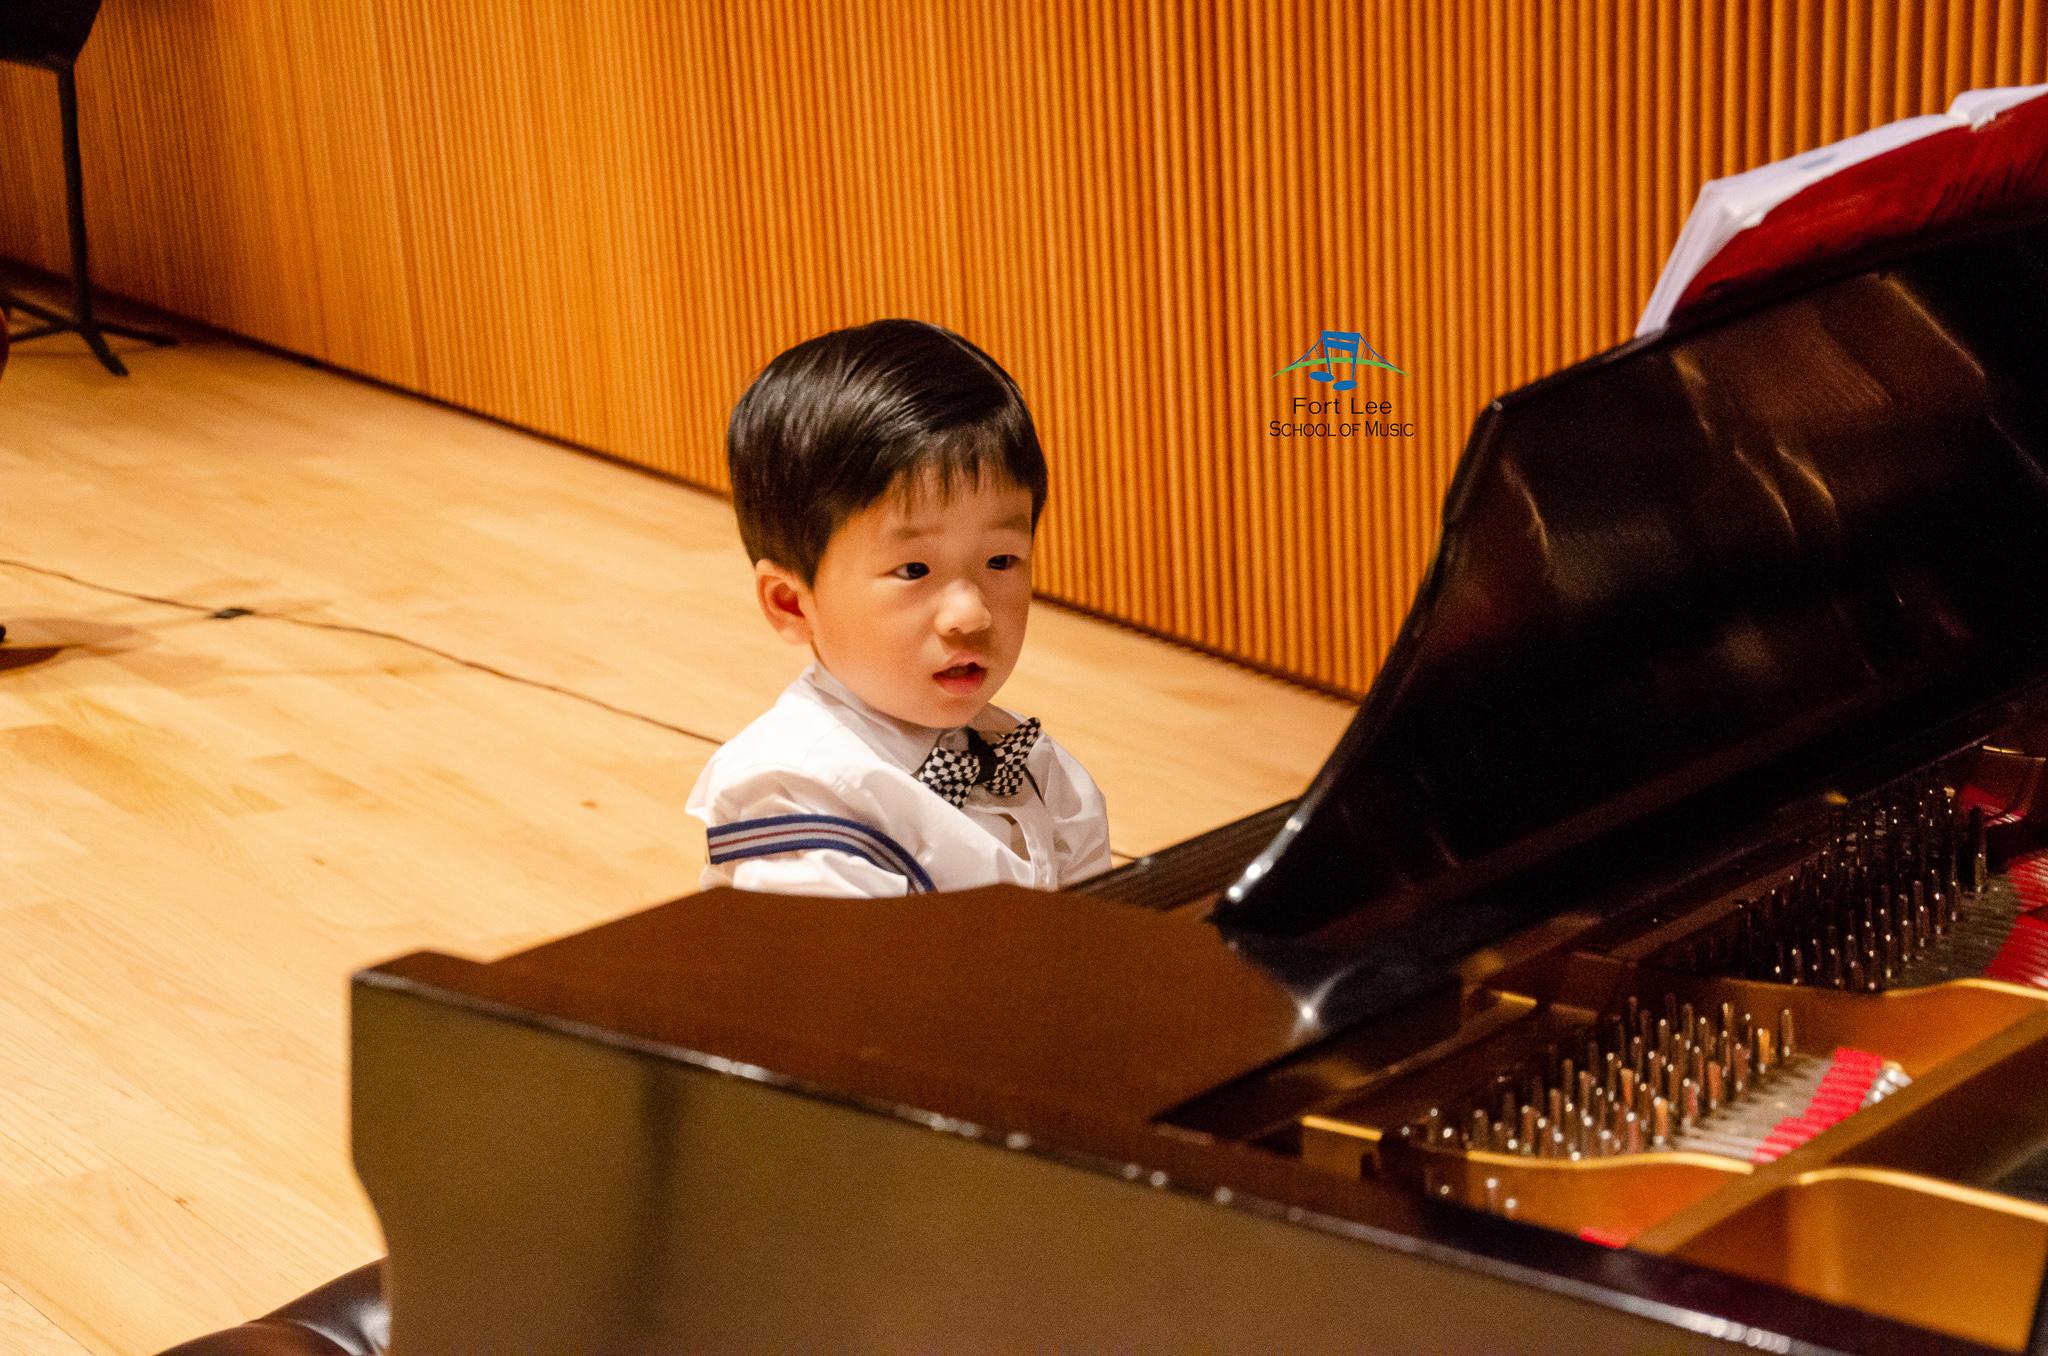 piano-lessons-near-me.jpg